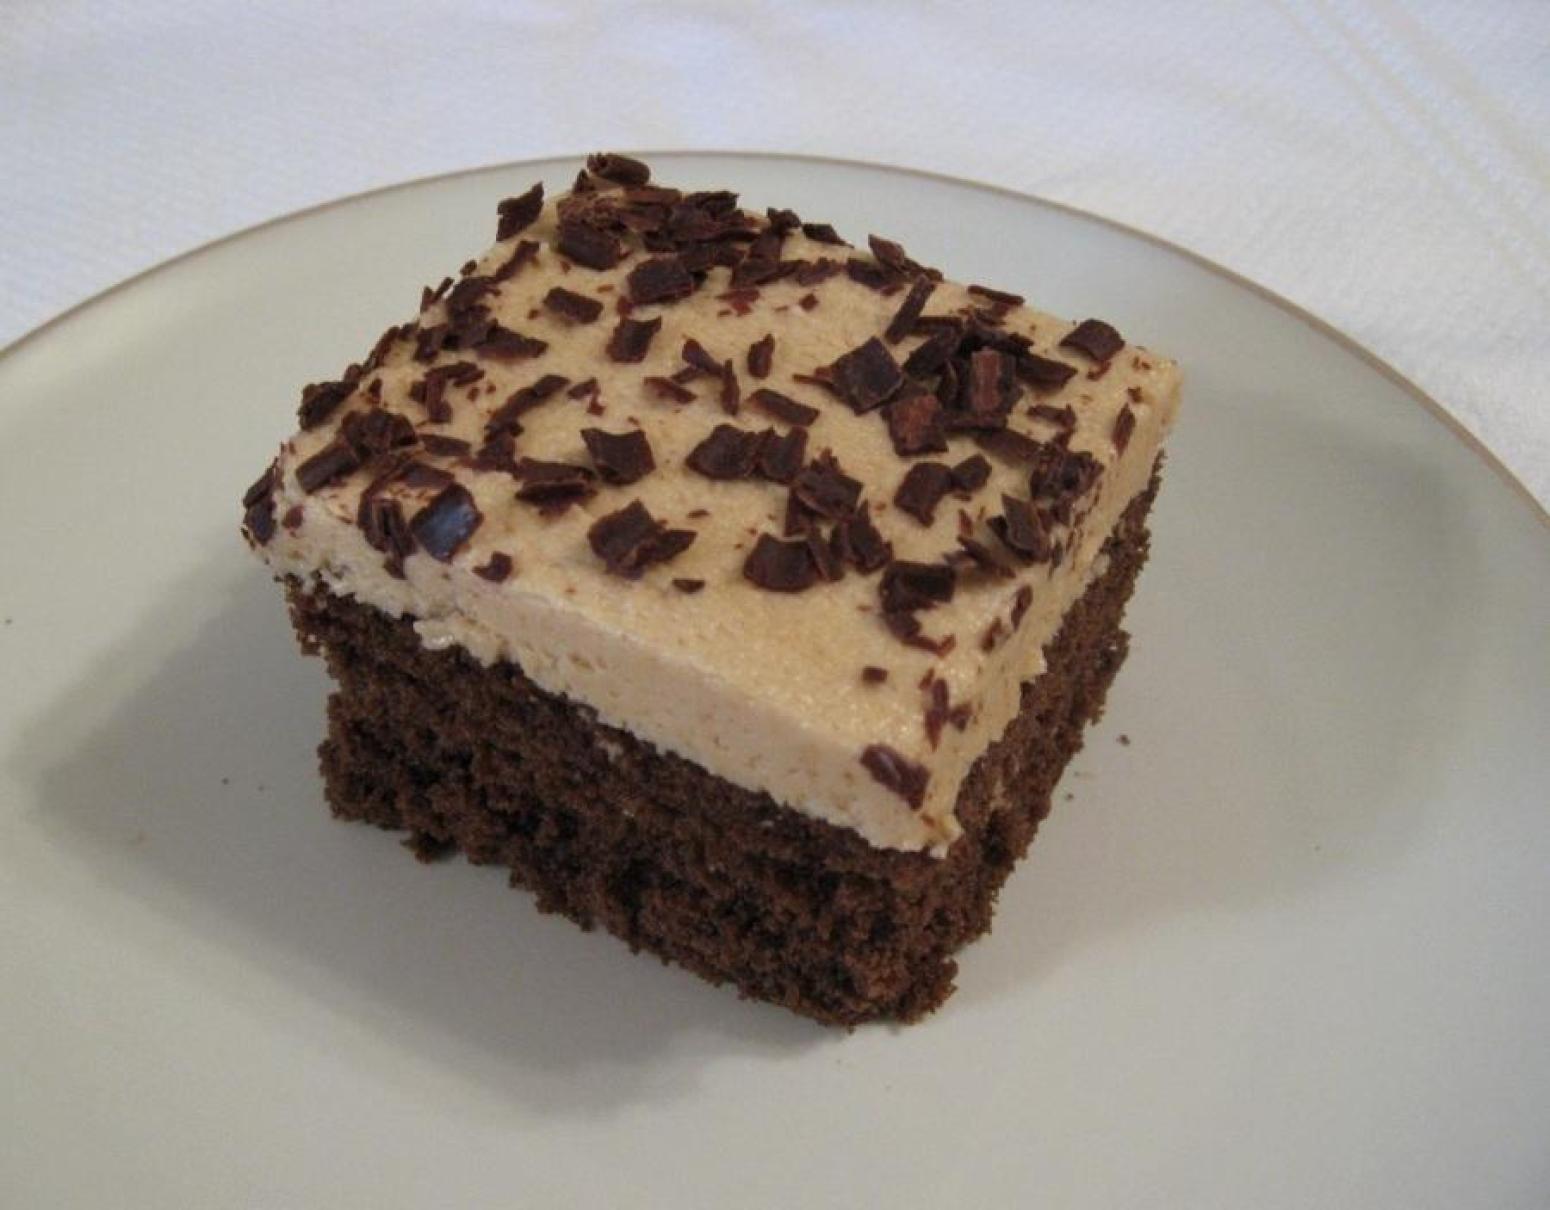 Cake Icing Recipe Peanut Butter: Chocolate Cake With Peanut Butter Frosting Recipe